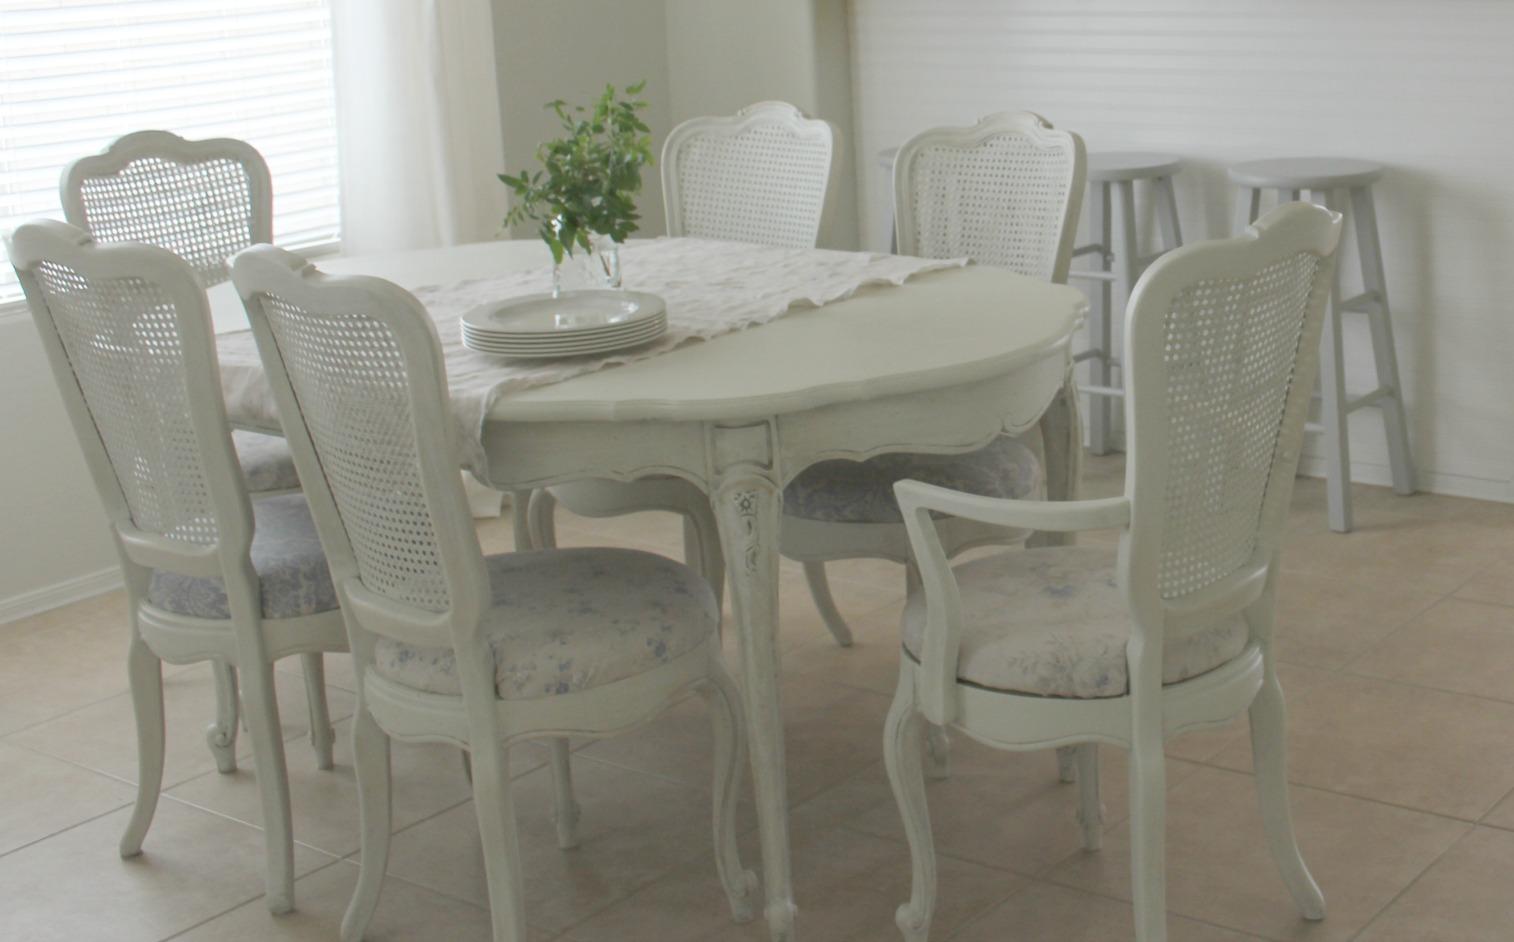 My vintage white shabby chic dining room set I transformed - Hello Lovely Studio